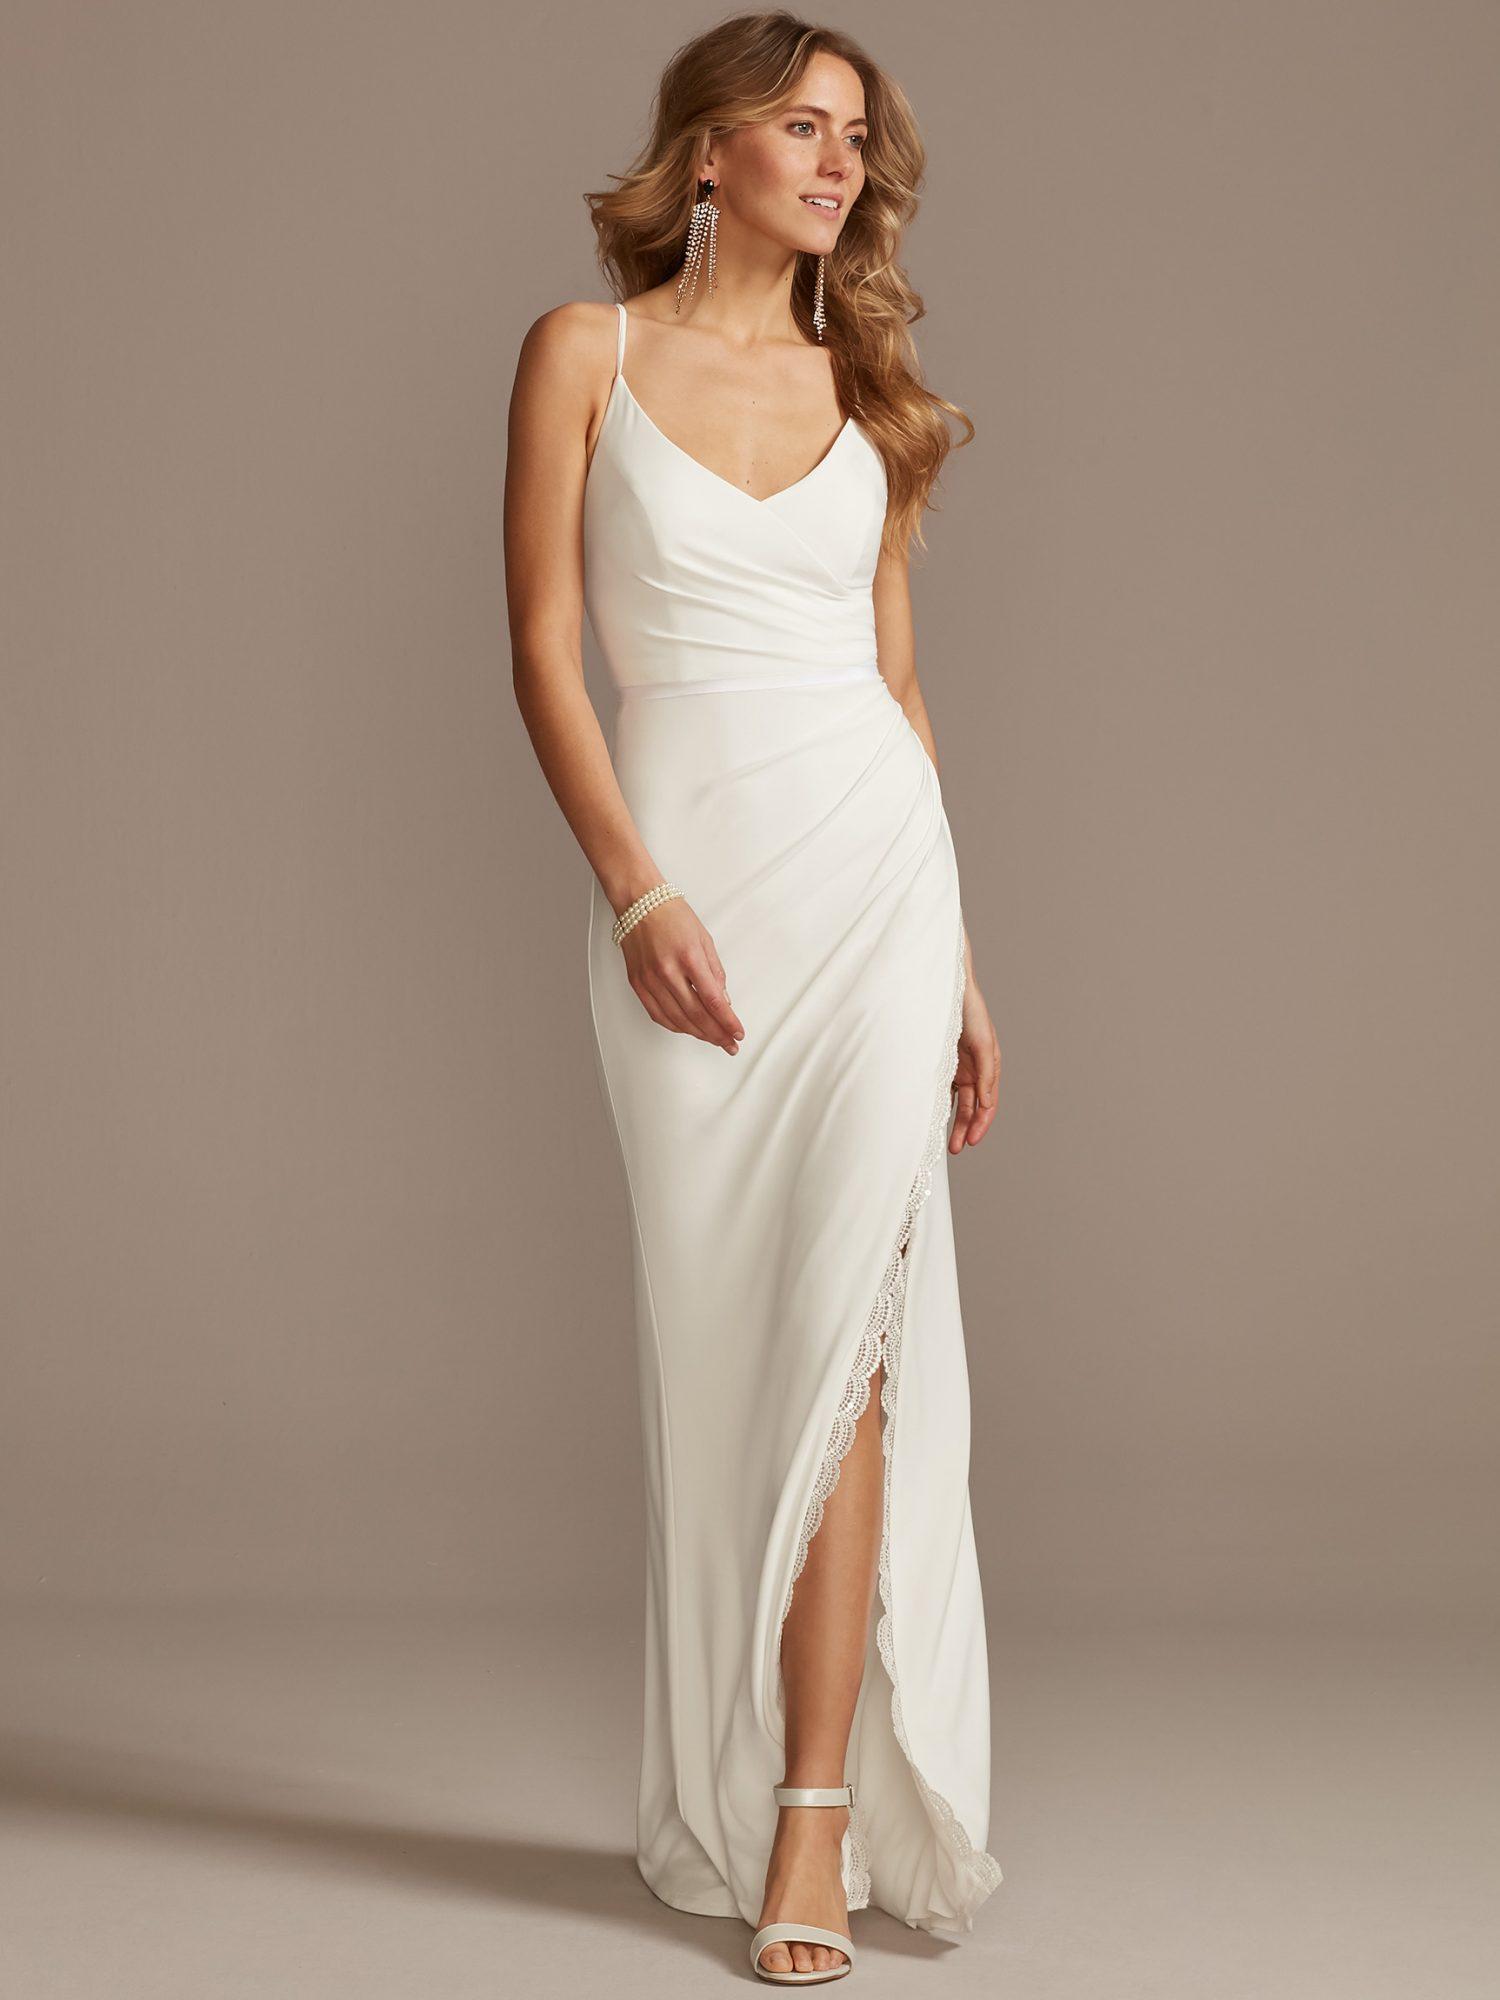 davids bridal thin strap side slit wedding dress spring 2021